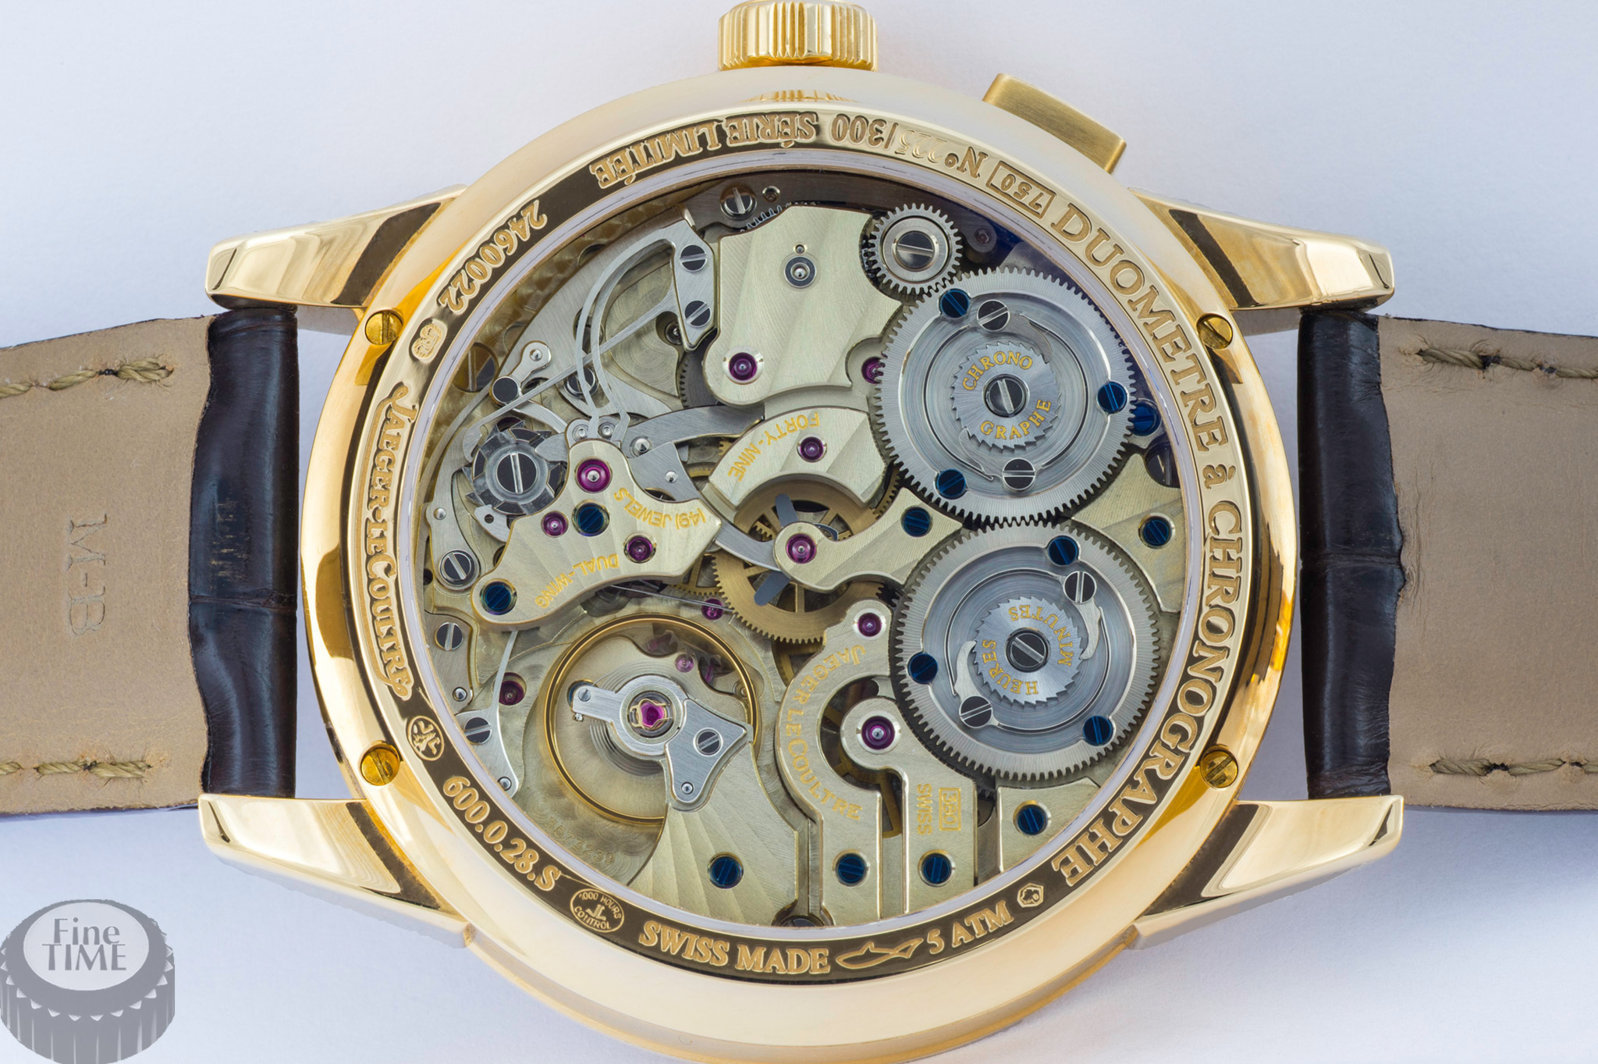 jaeger-lecoultre-duometre-chronographe-q6011420-02.jpg